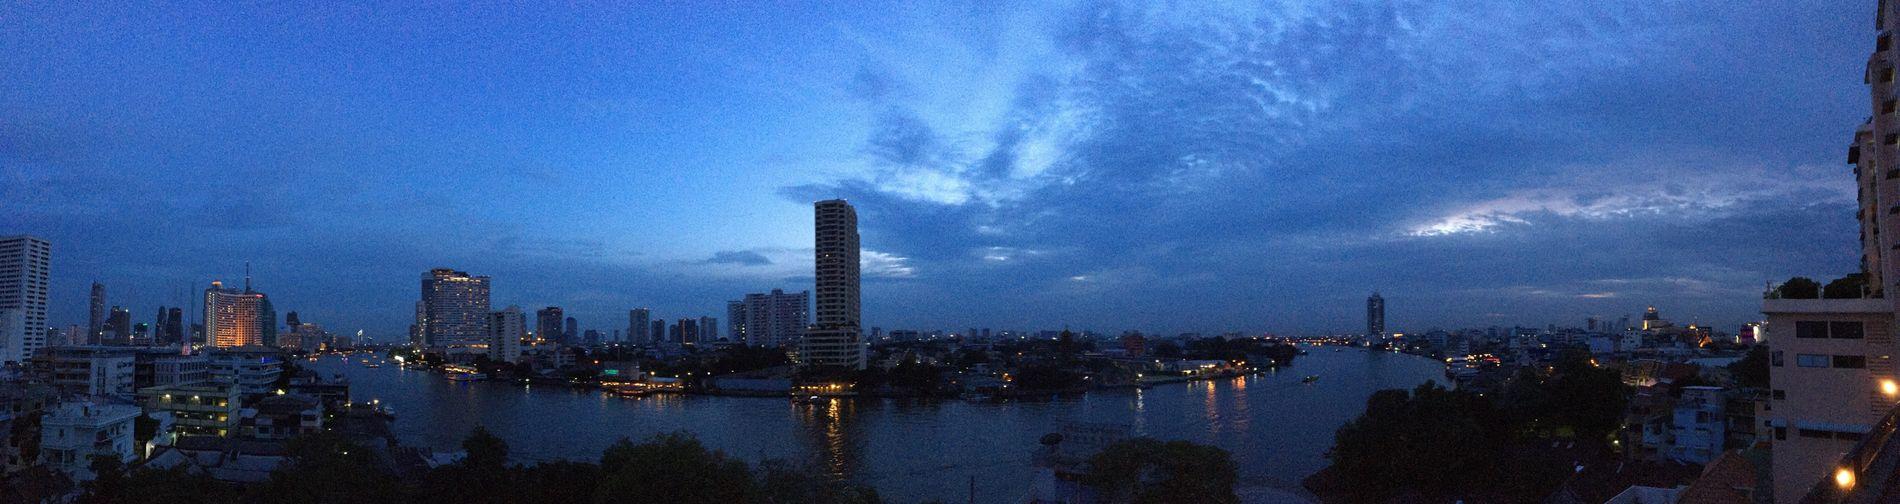 Sunset @ Chaopraya river Thailand City Water Skyscraper Sky First Eyeem Photo